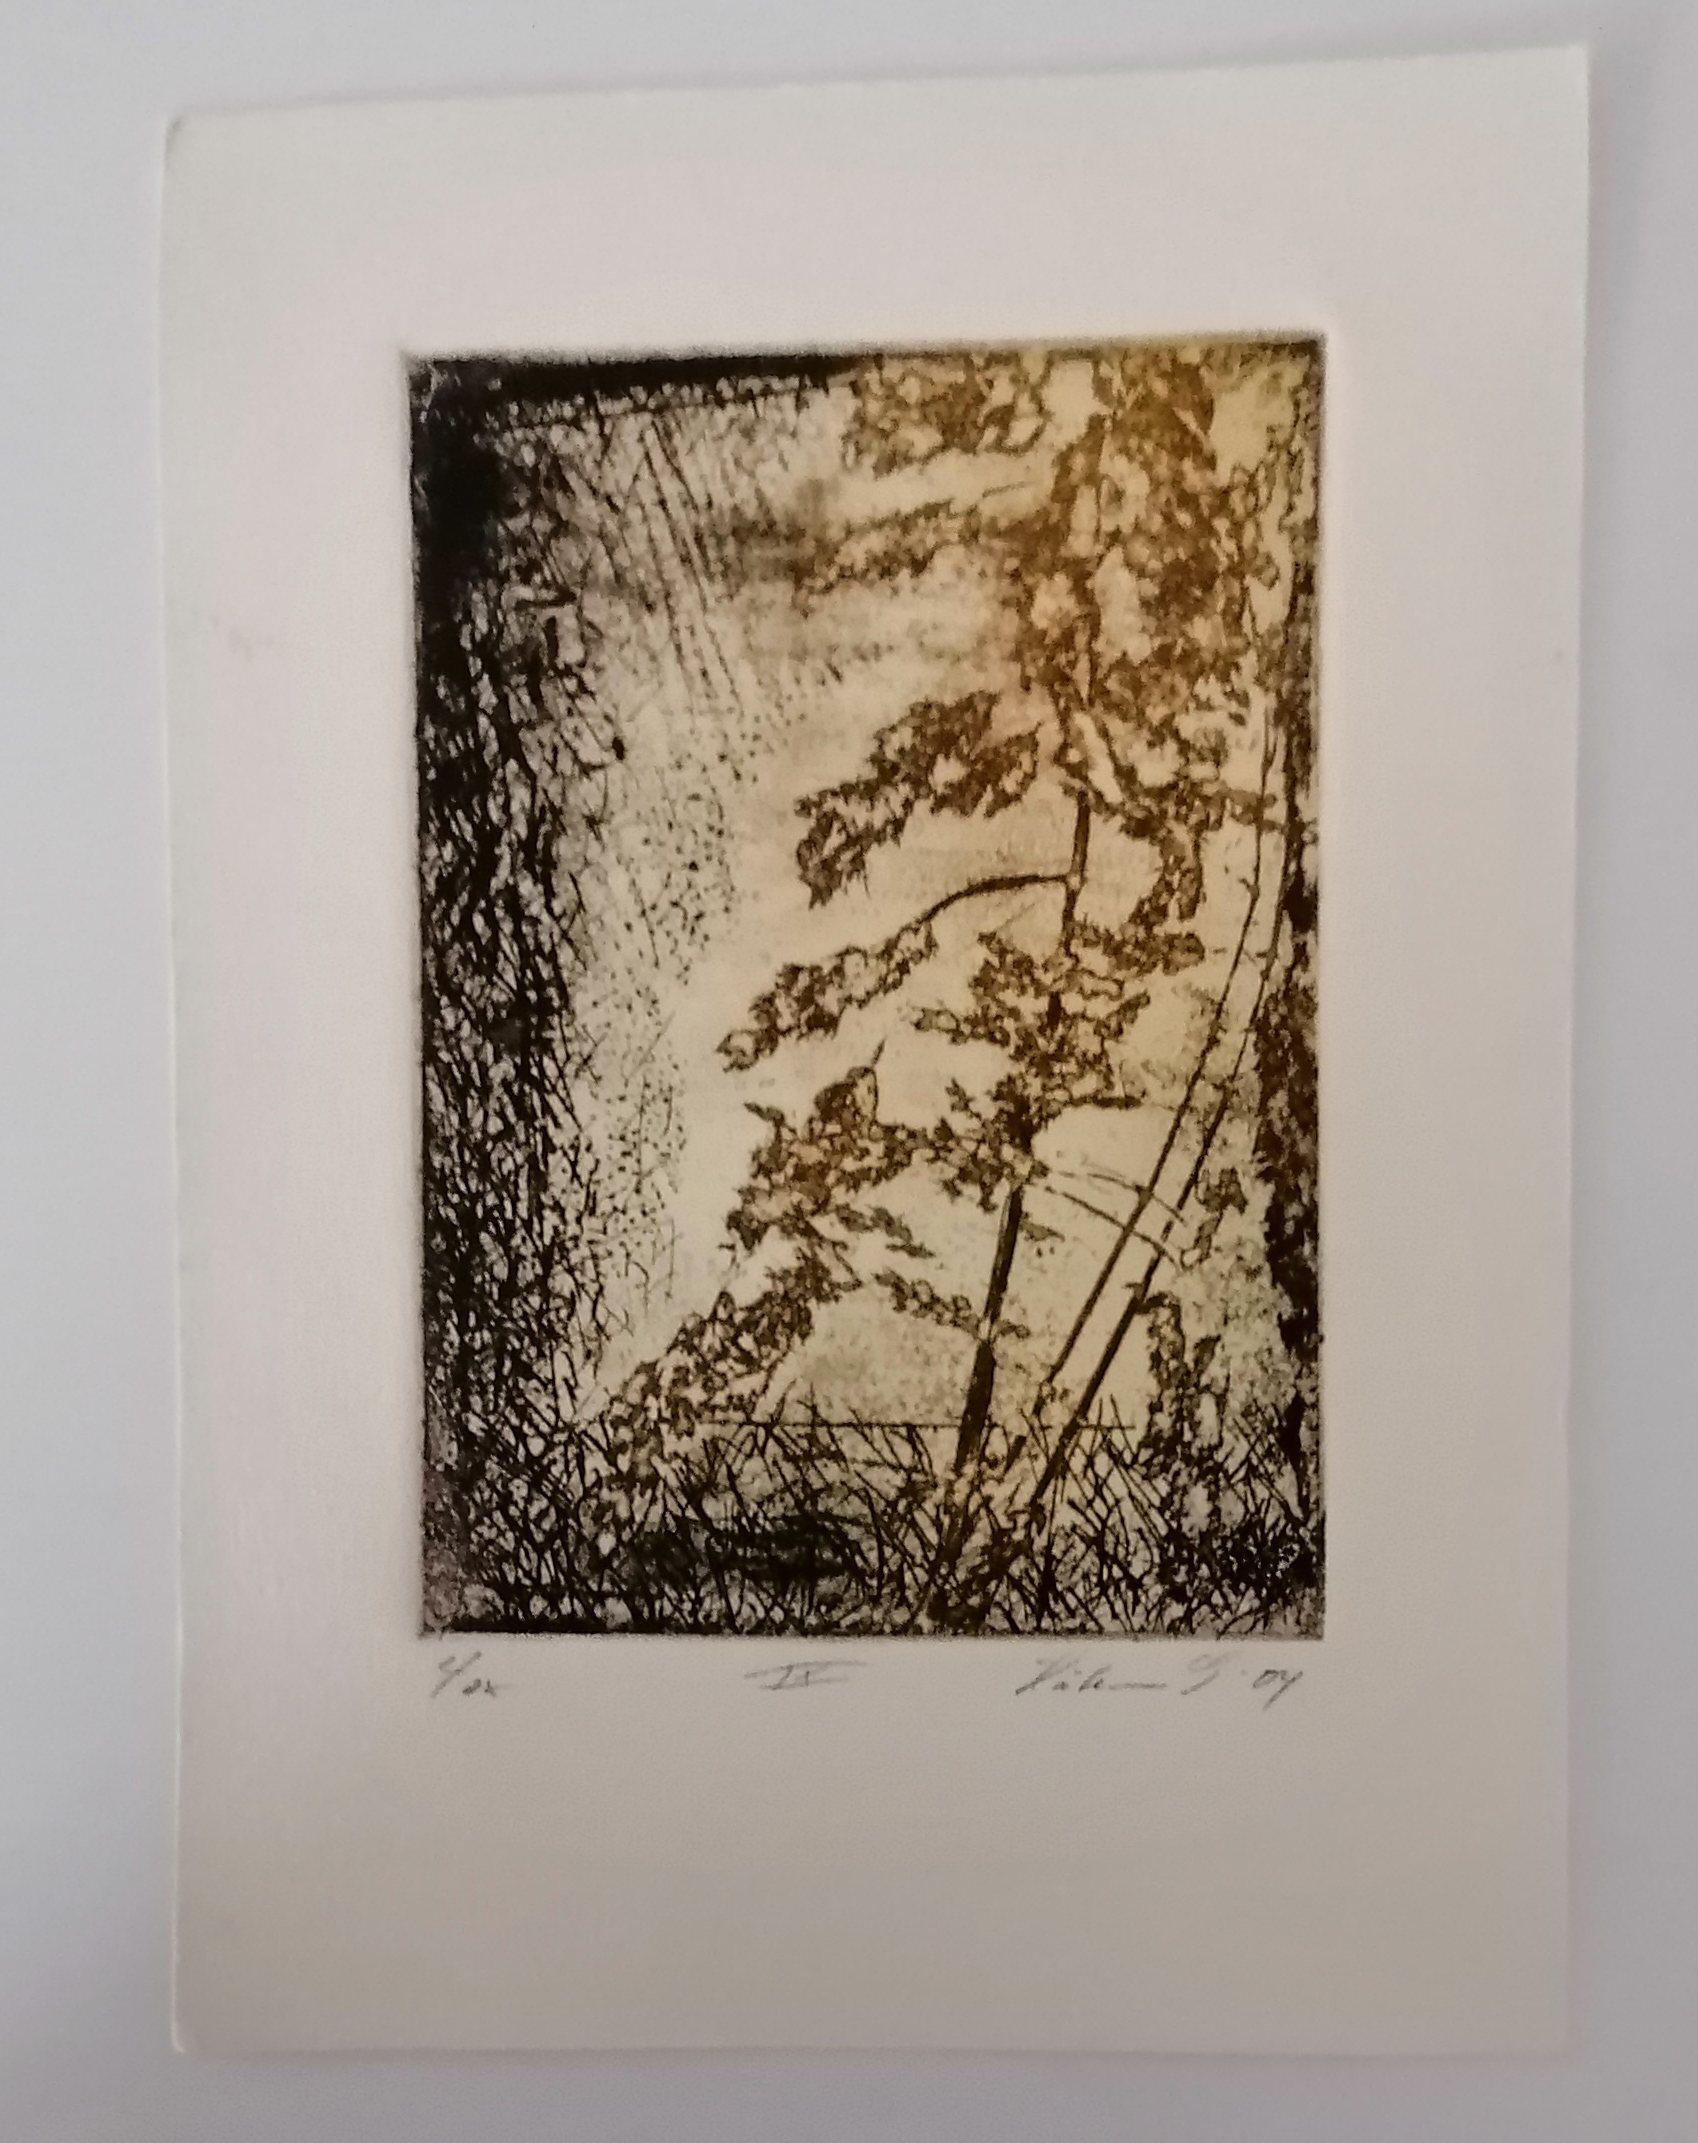 https://www.norstamps.com/content/images/stamps/gtgallerier/191.jpg